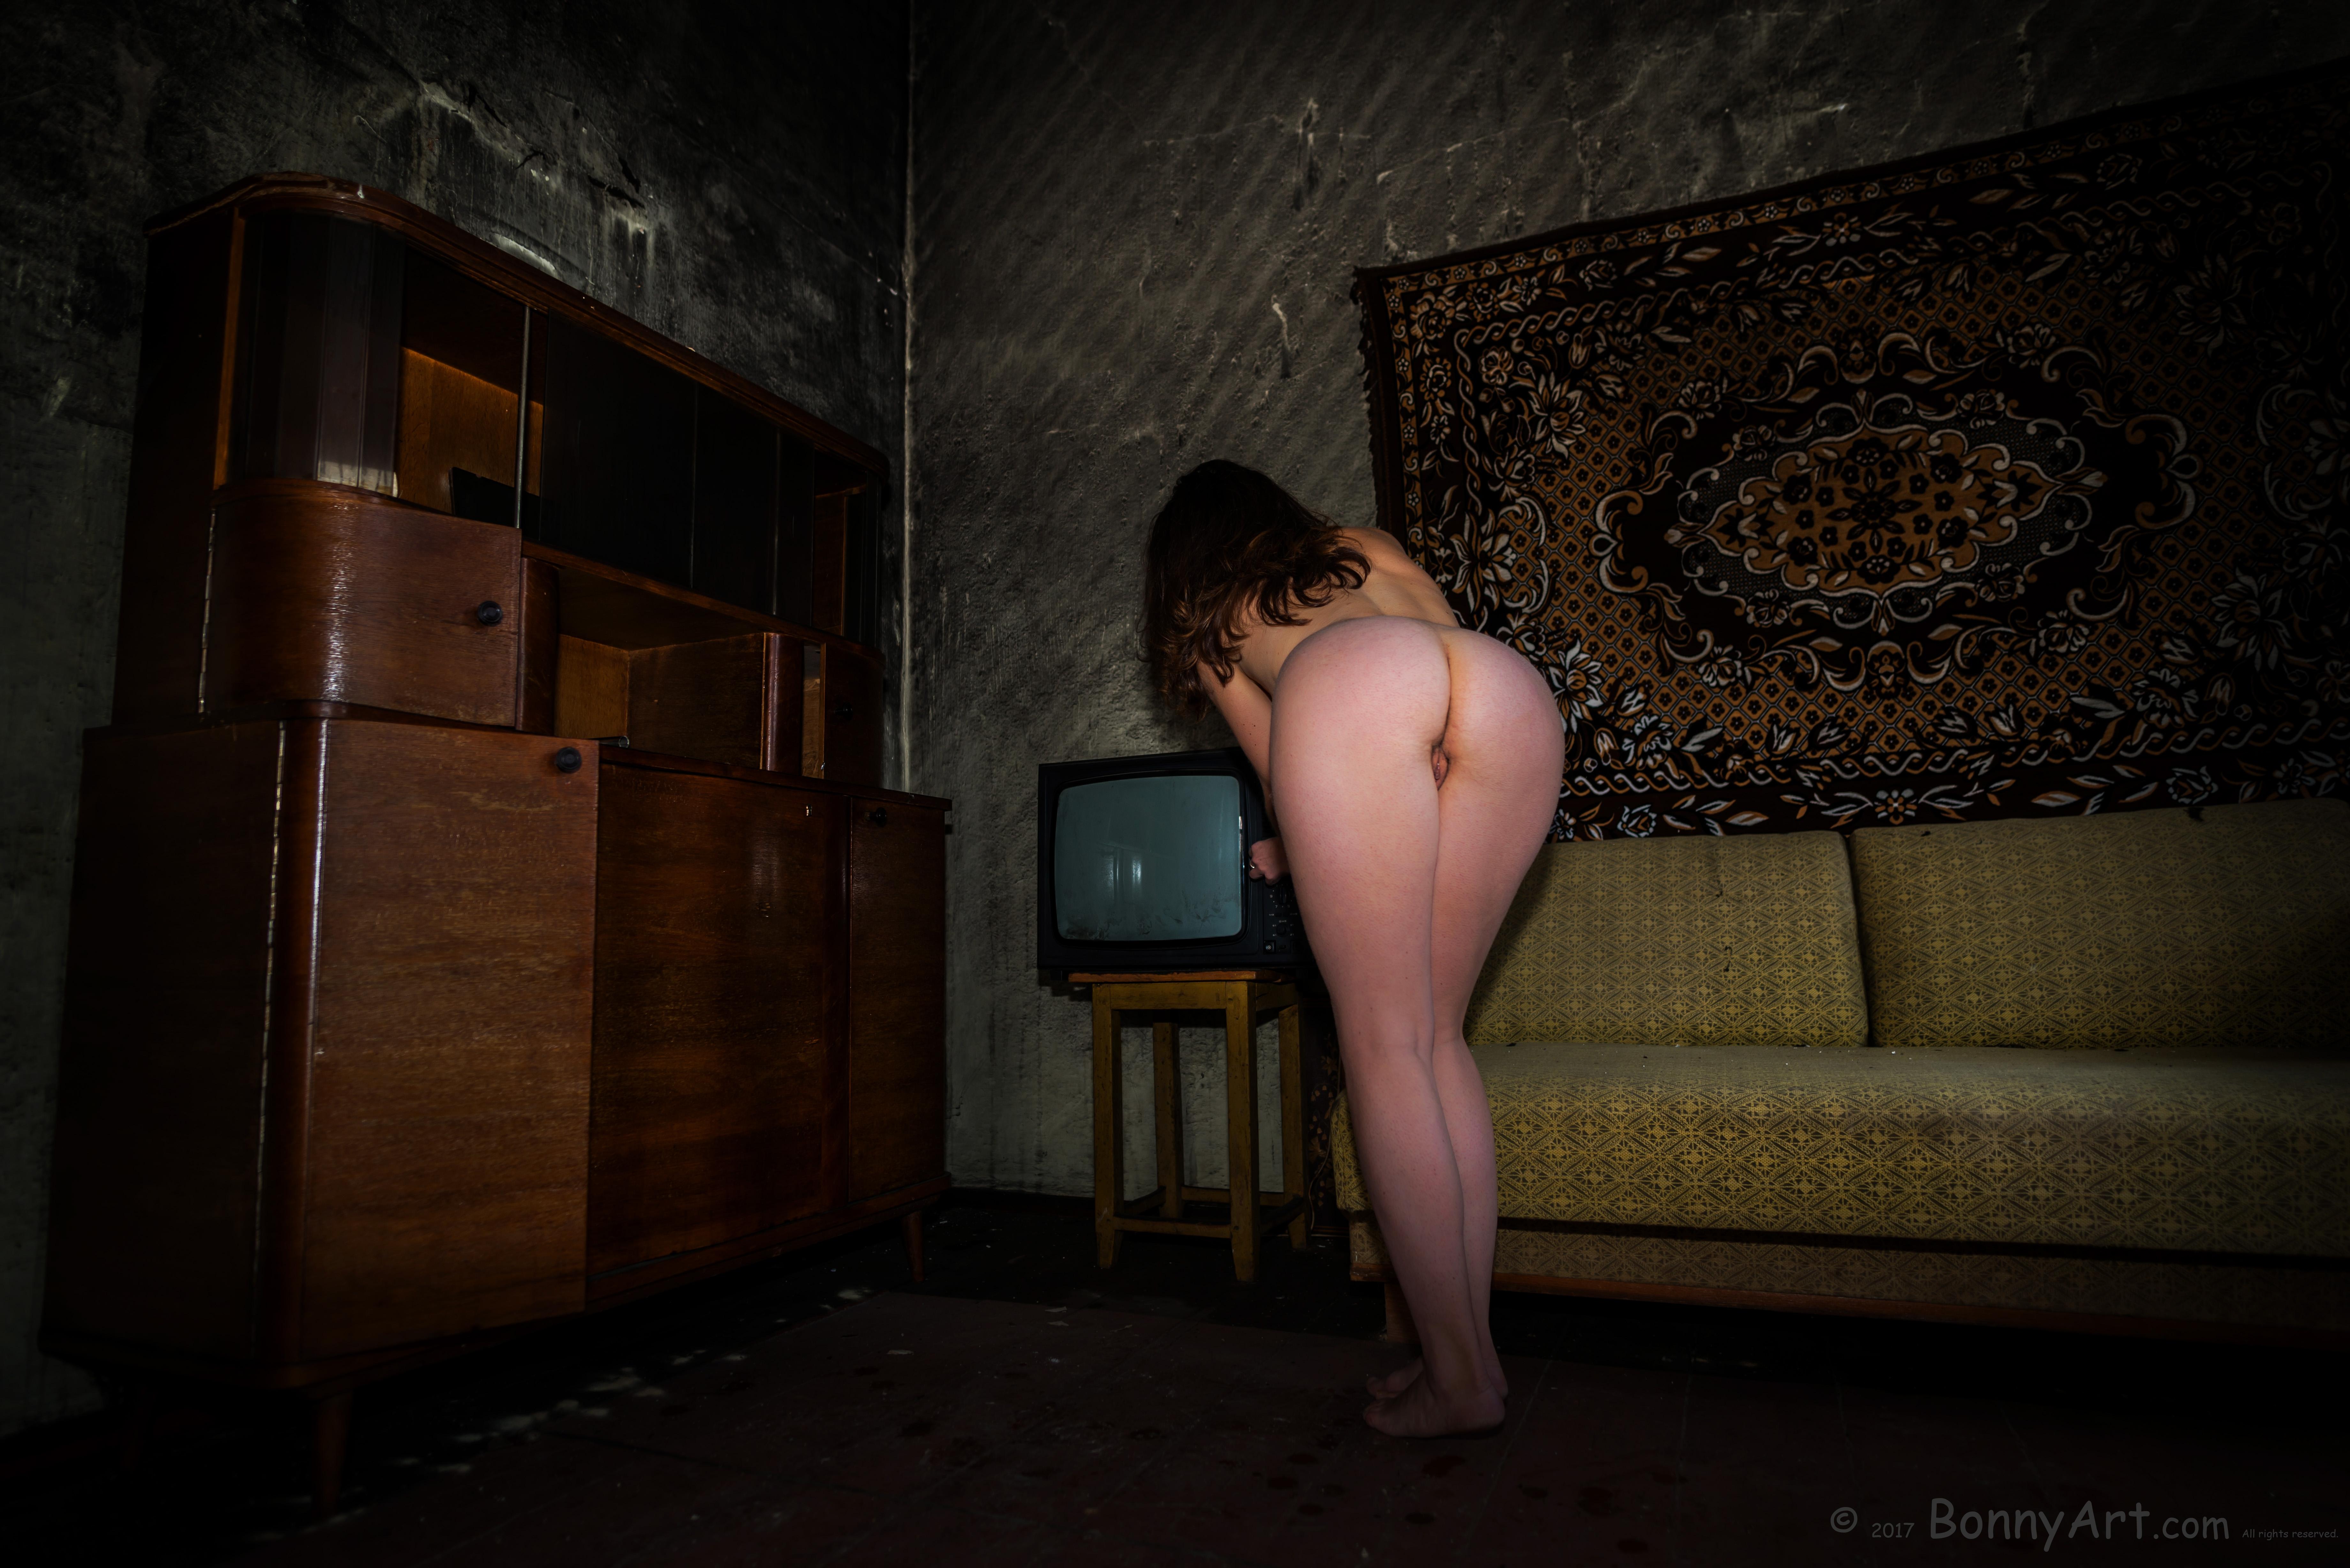 Bending Over in Vintage Horror Apartment